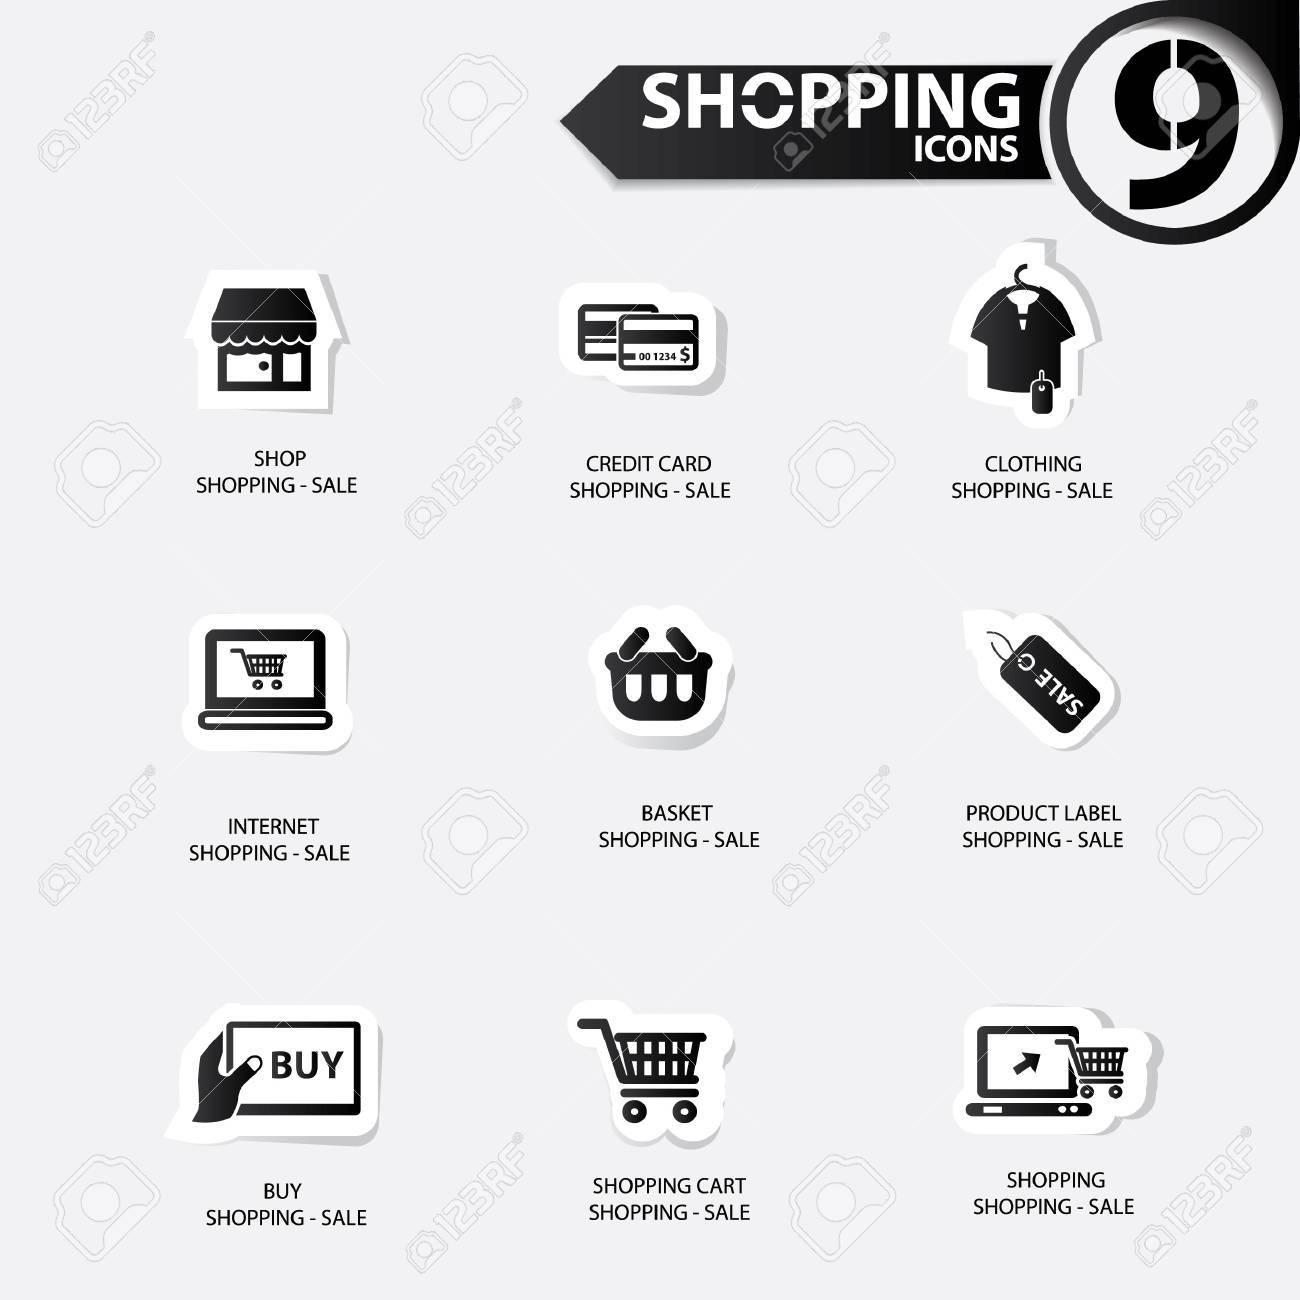 Shopping icons Stock Vector - 20616506